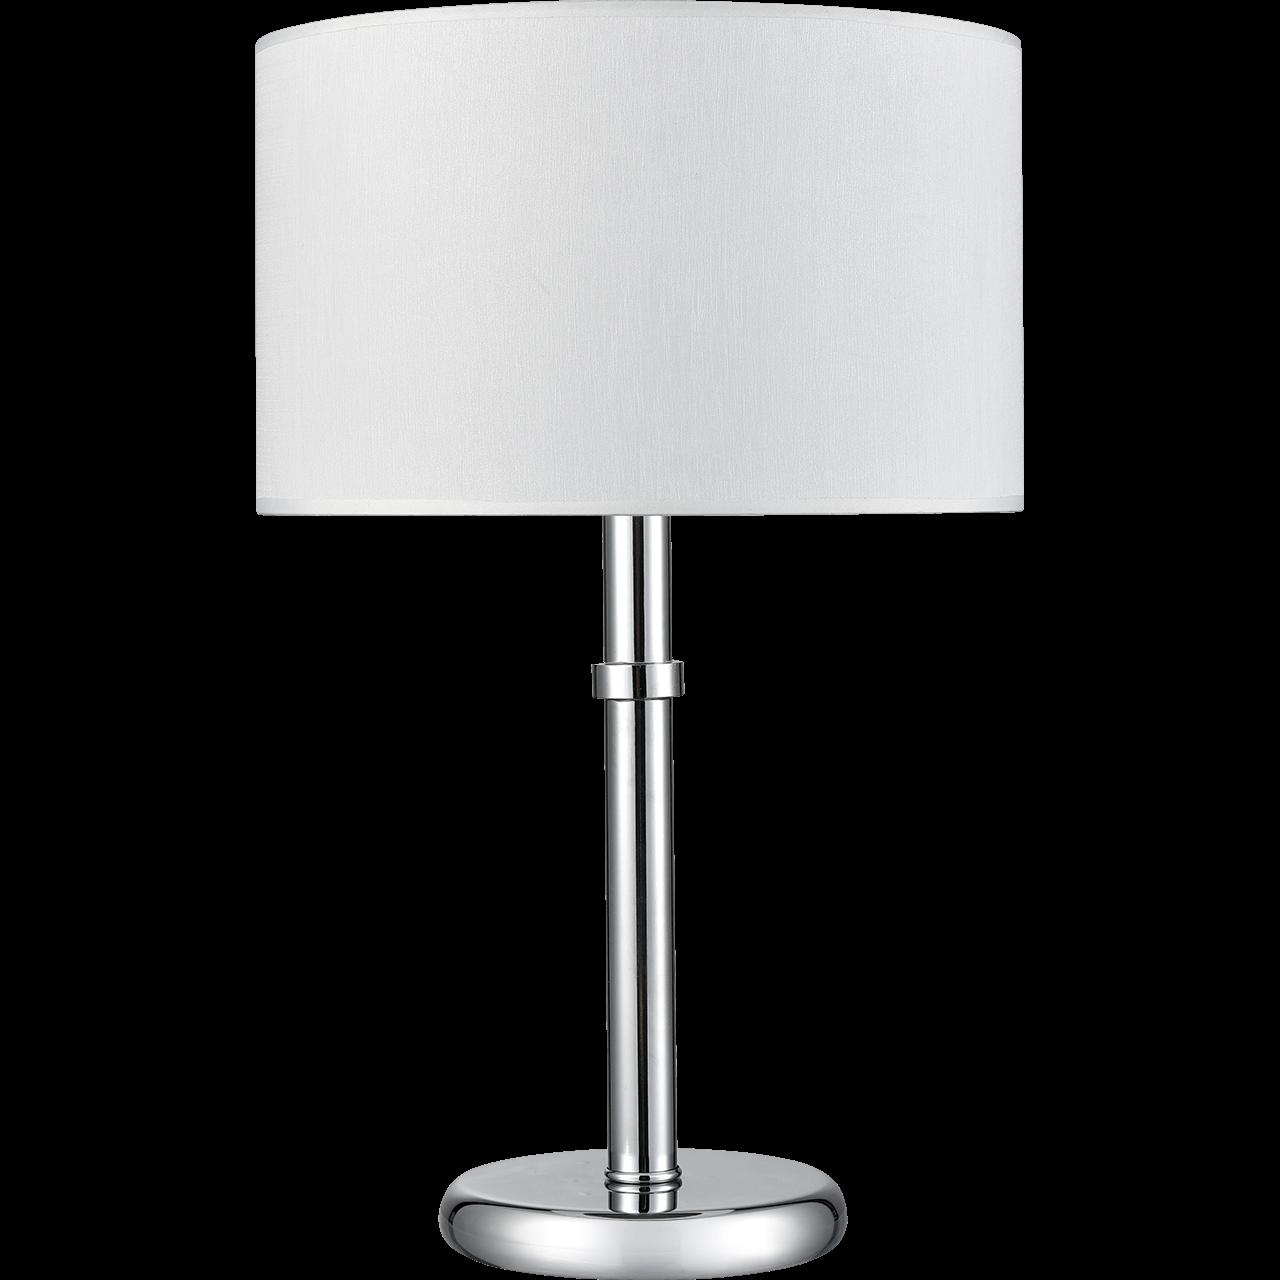 Настольная лампа Vele Luce Princess VL1753N01 настольная лампа декоративная vele luce toppi vl1841n01